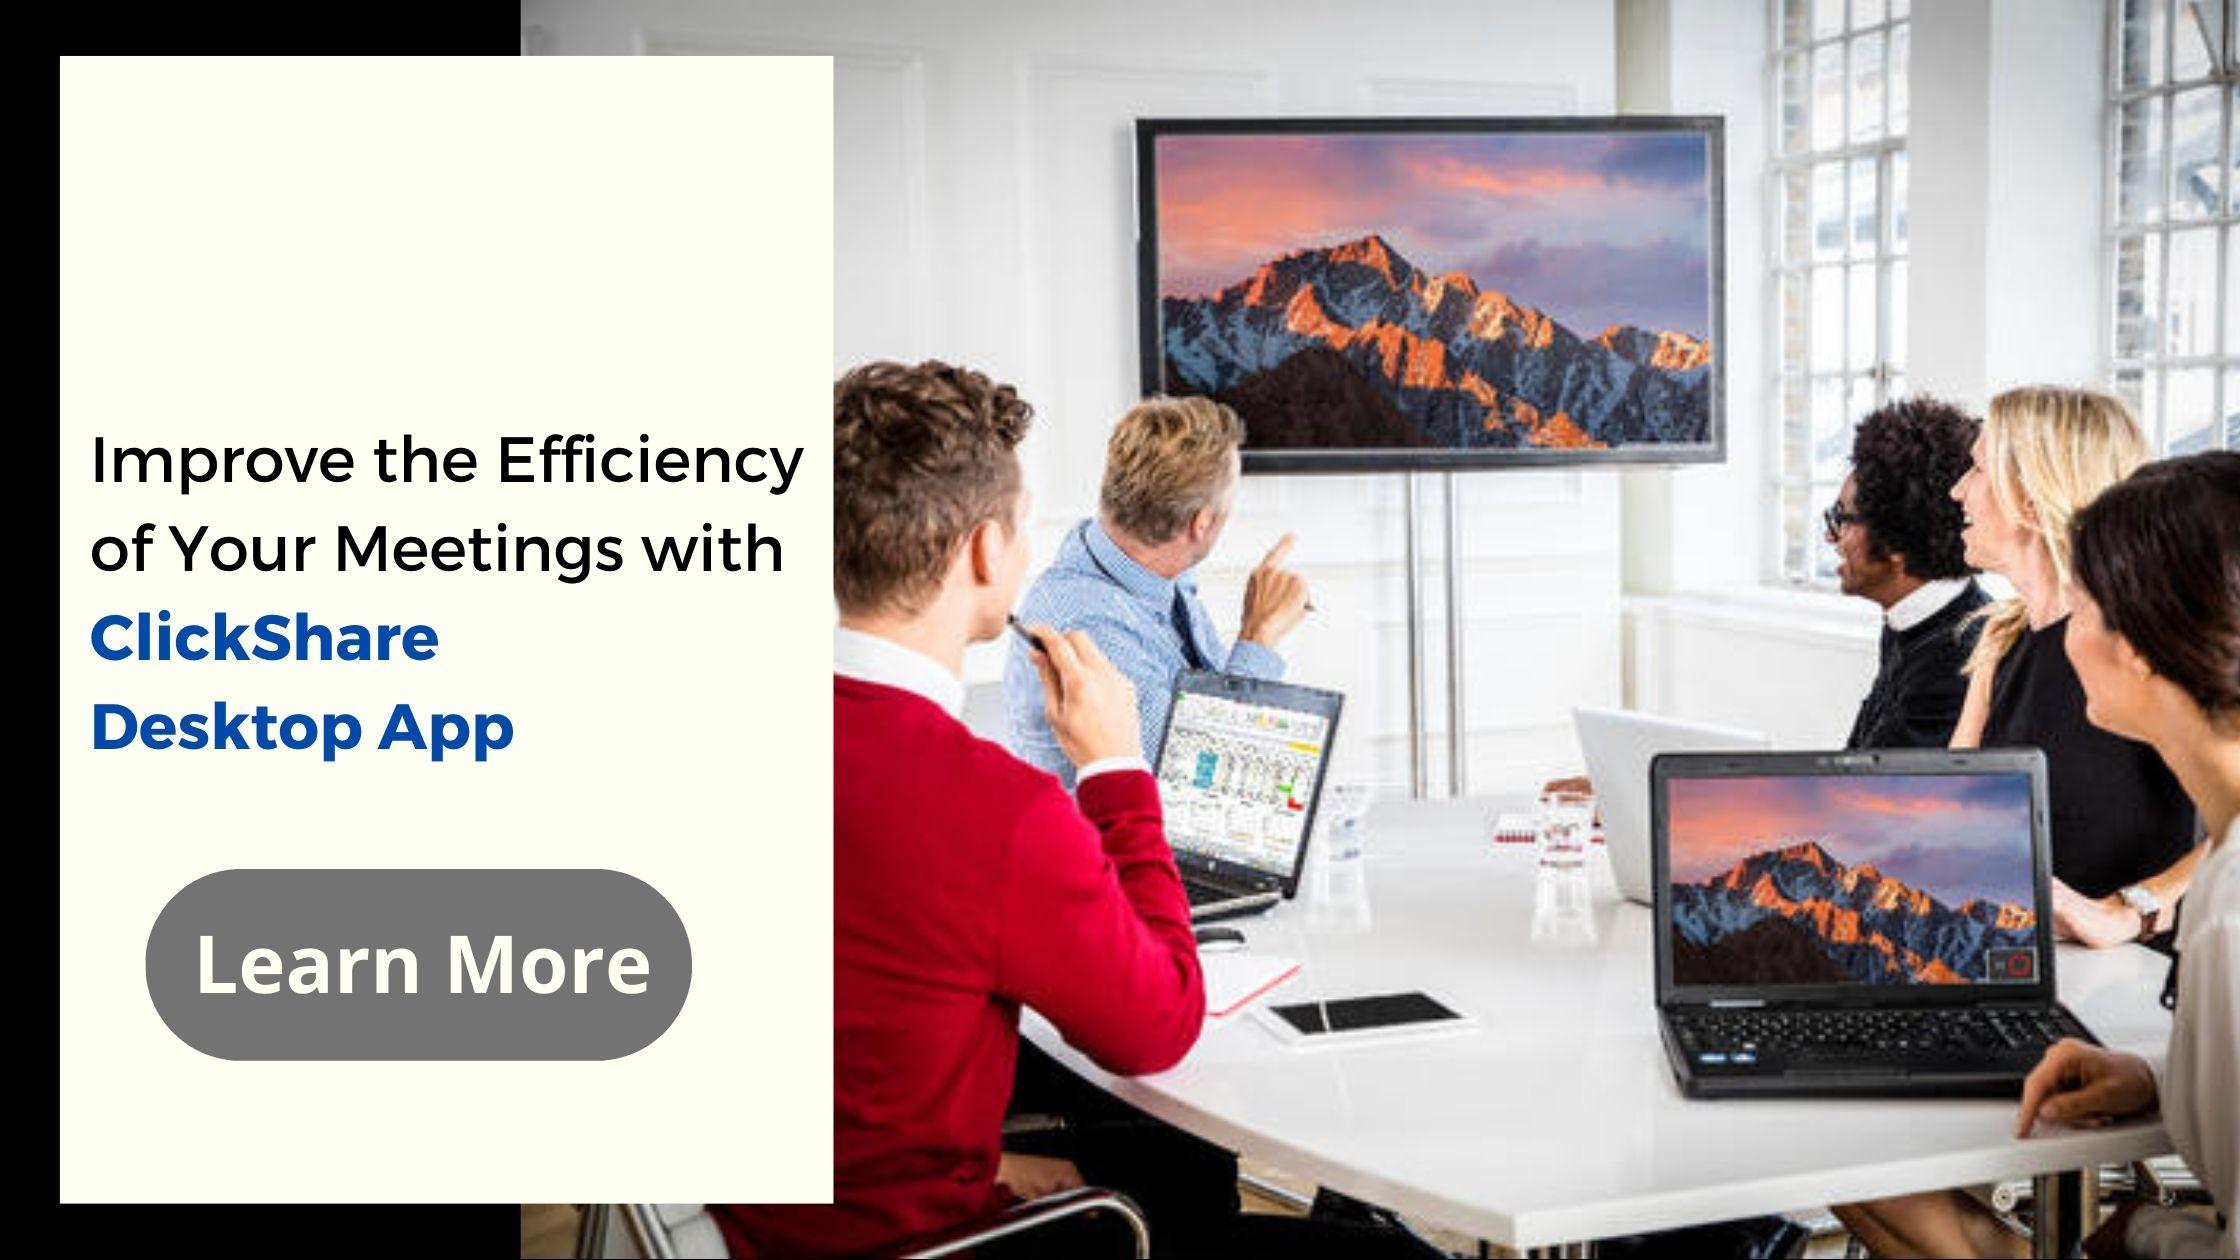 Improve the Efficiency of Your Meetings with ClickShare Desktop App